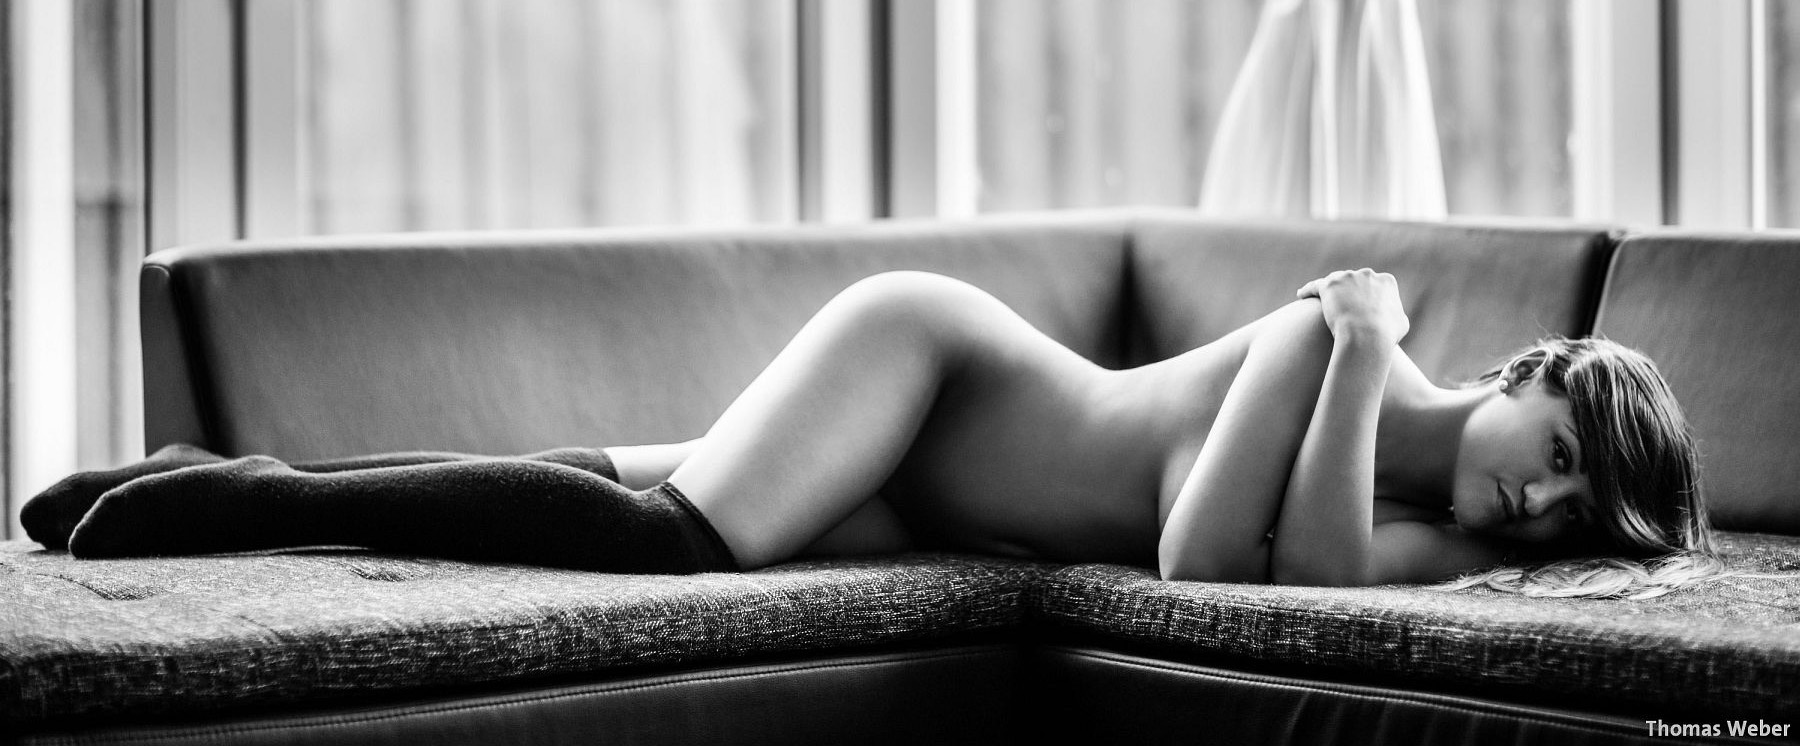 Fotograf Thomas Weber aus Oldenburg: Erotische Portraits im Fotostudio (8)